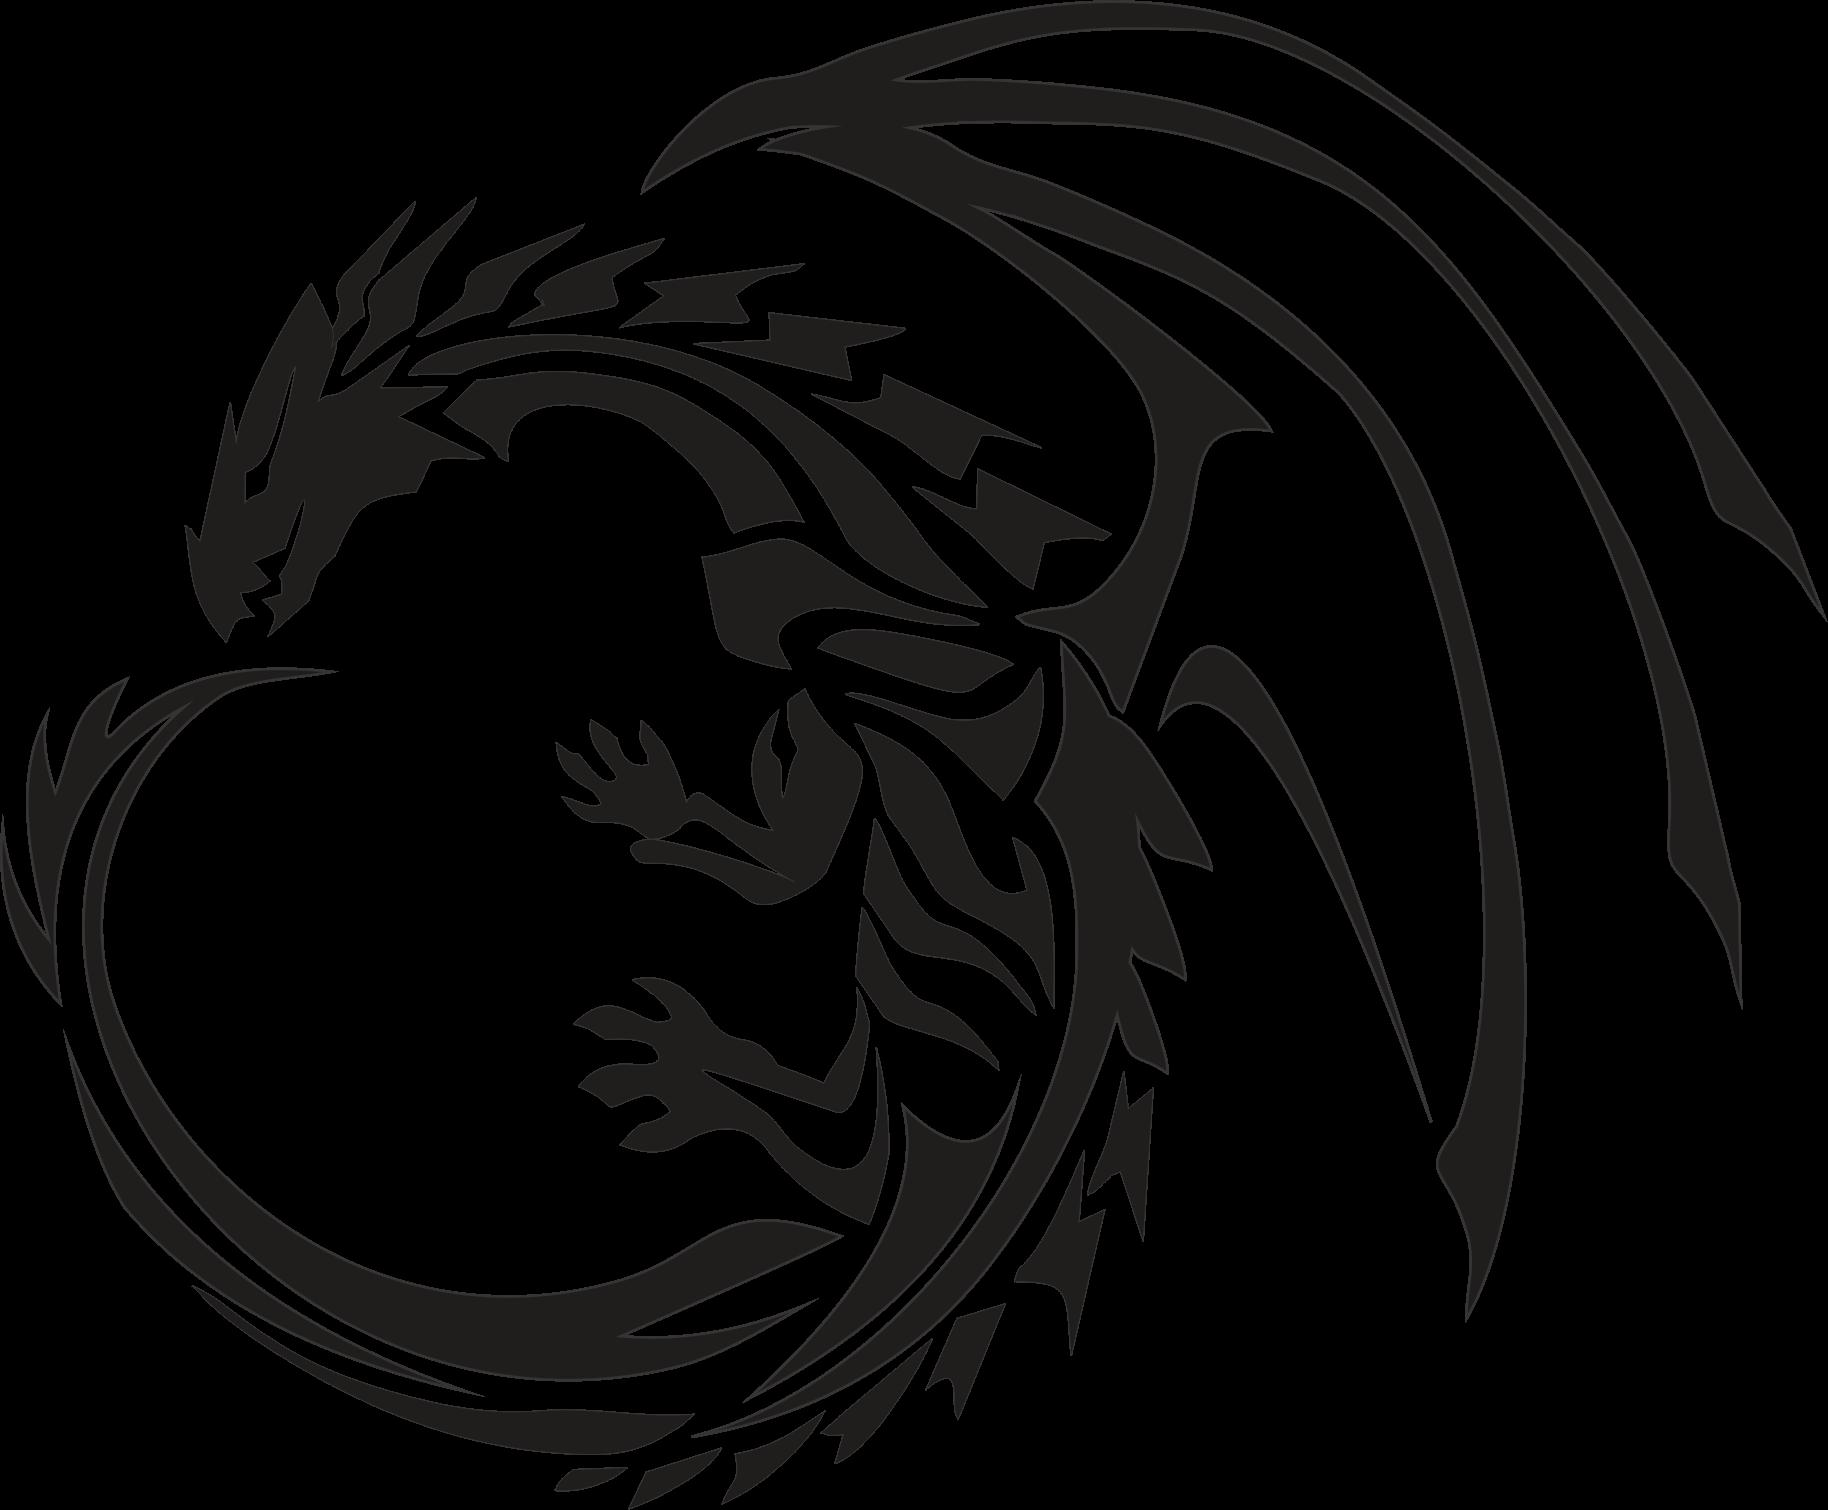 Tattoo transparent png stickpng. Circle clipart dragon